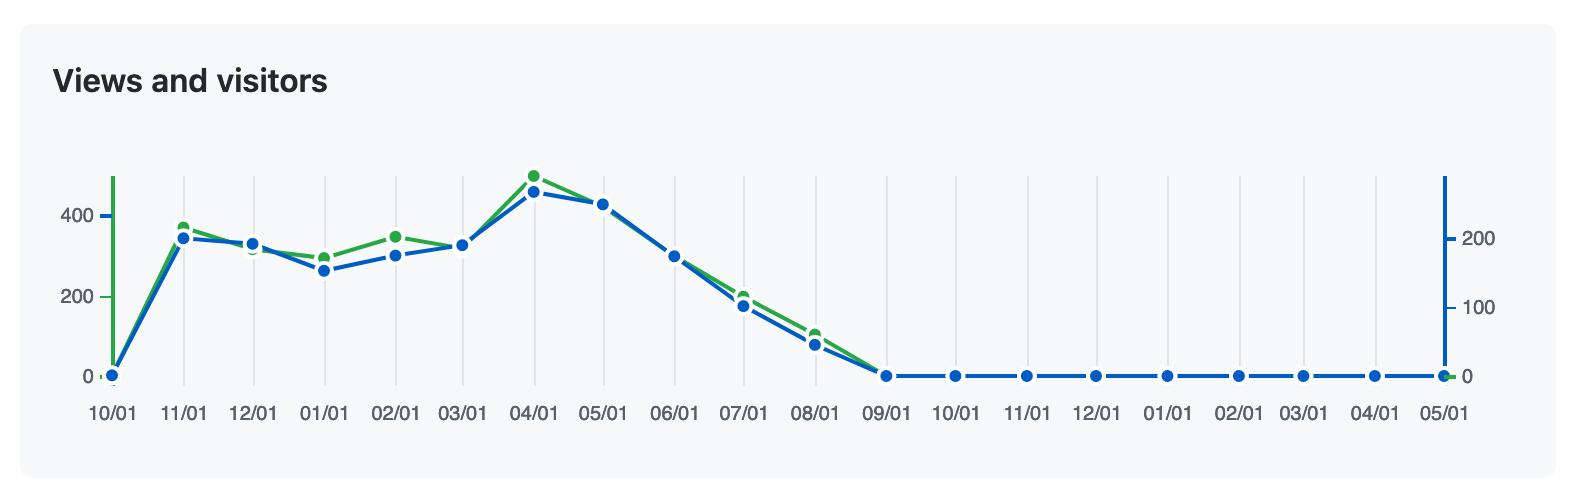 GitHub Marketplace Insights - Missing data